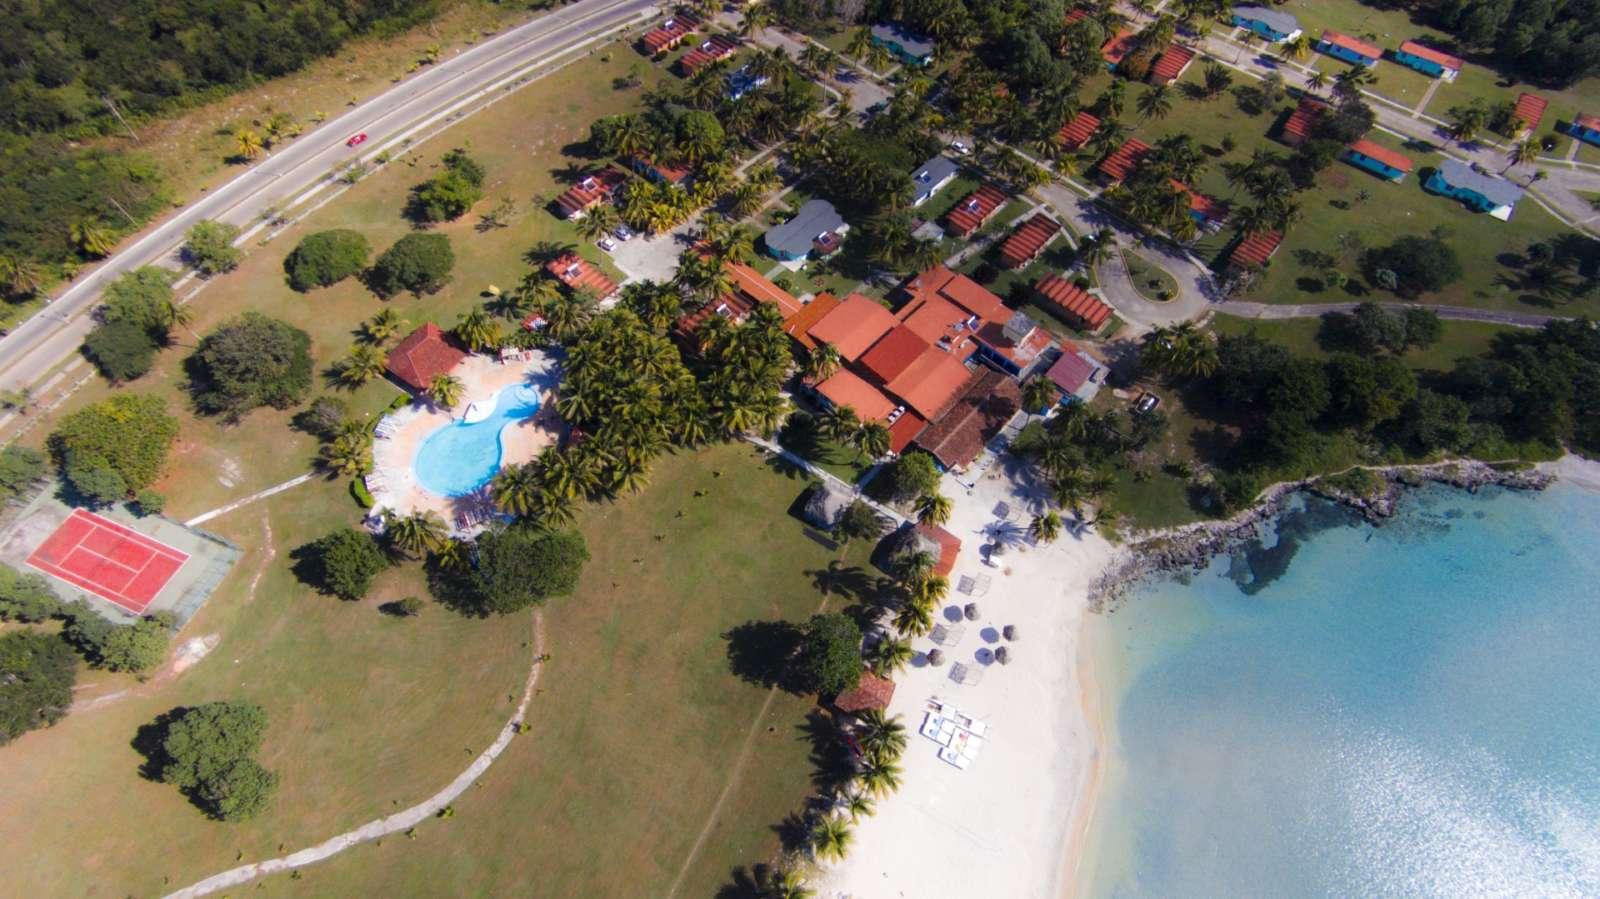 Aerial view of Hotel Playa Larga